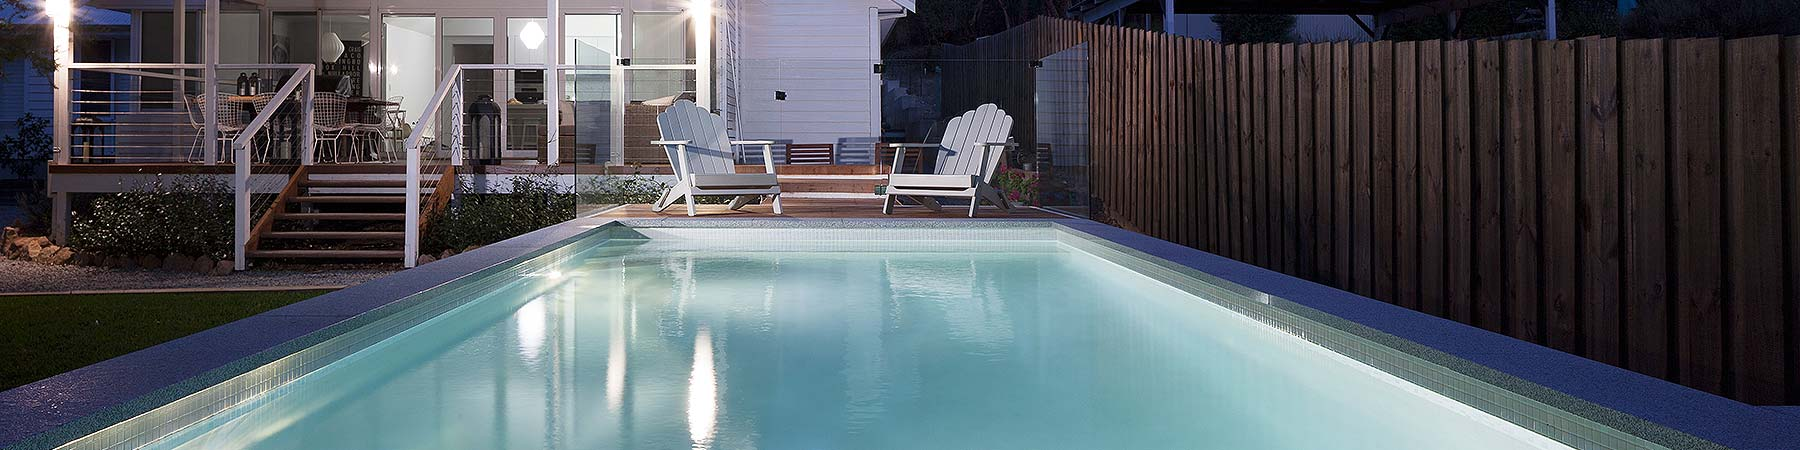 Swimming-Pool-Interior-Sandy-Beach